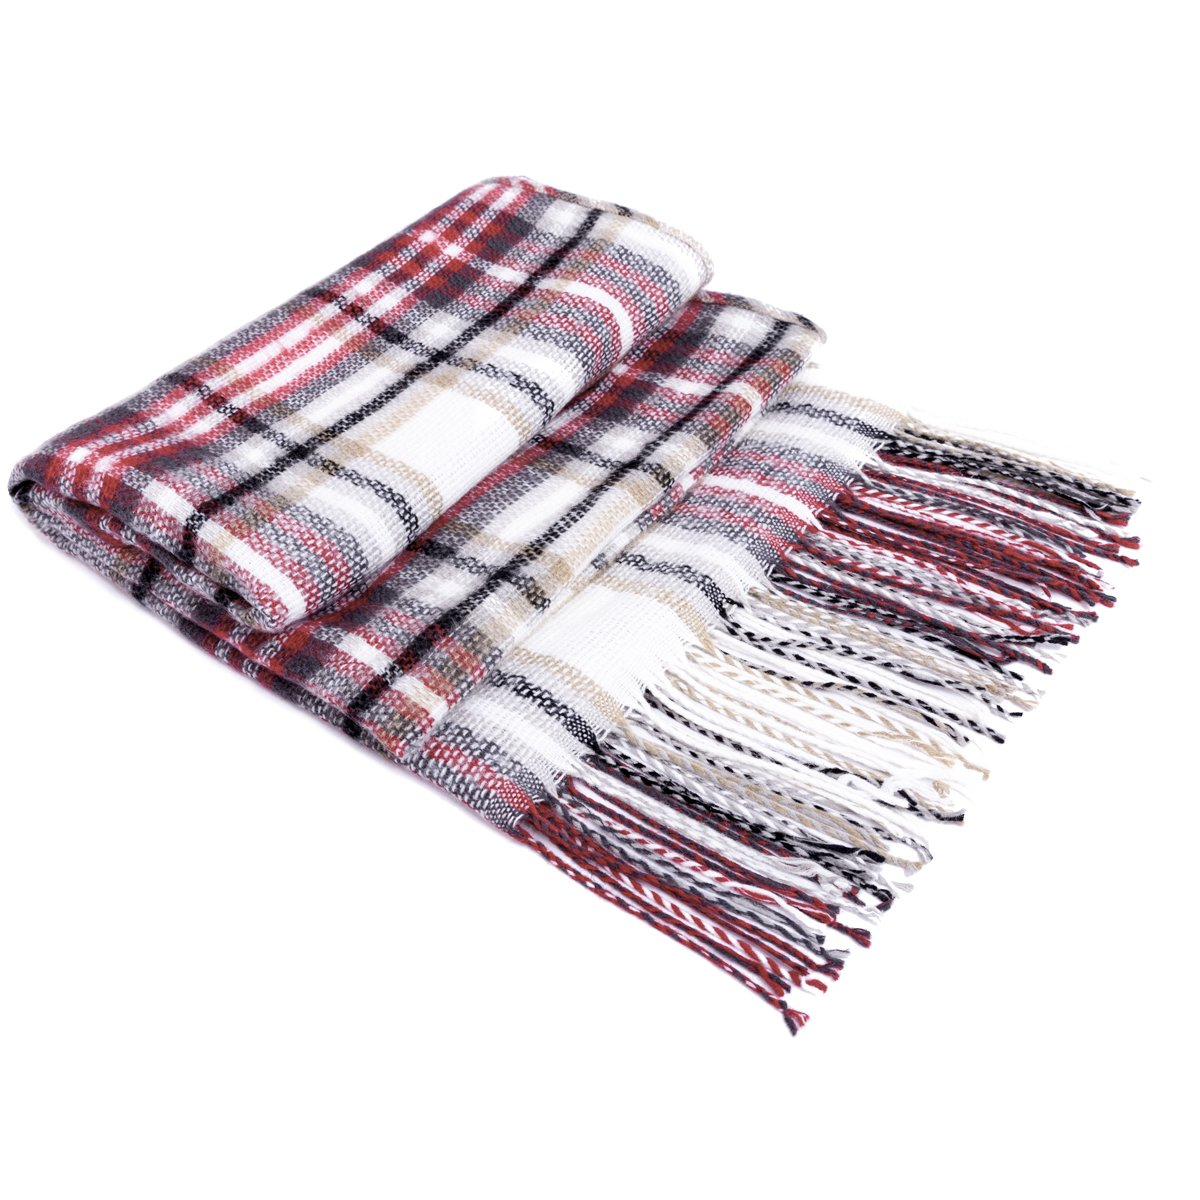 Women\'s Winter Scarf Tartan Tassel Plaid Shawl Large Warm Soft Chunky Square Scarf Wrap Blanket (New-002)